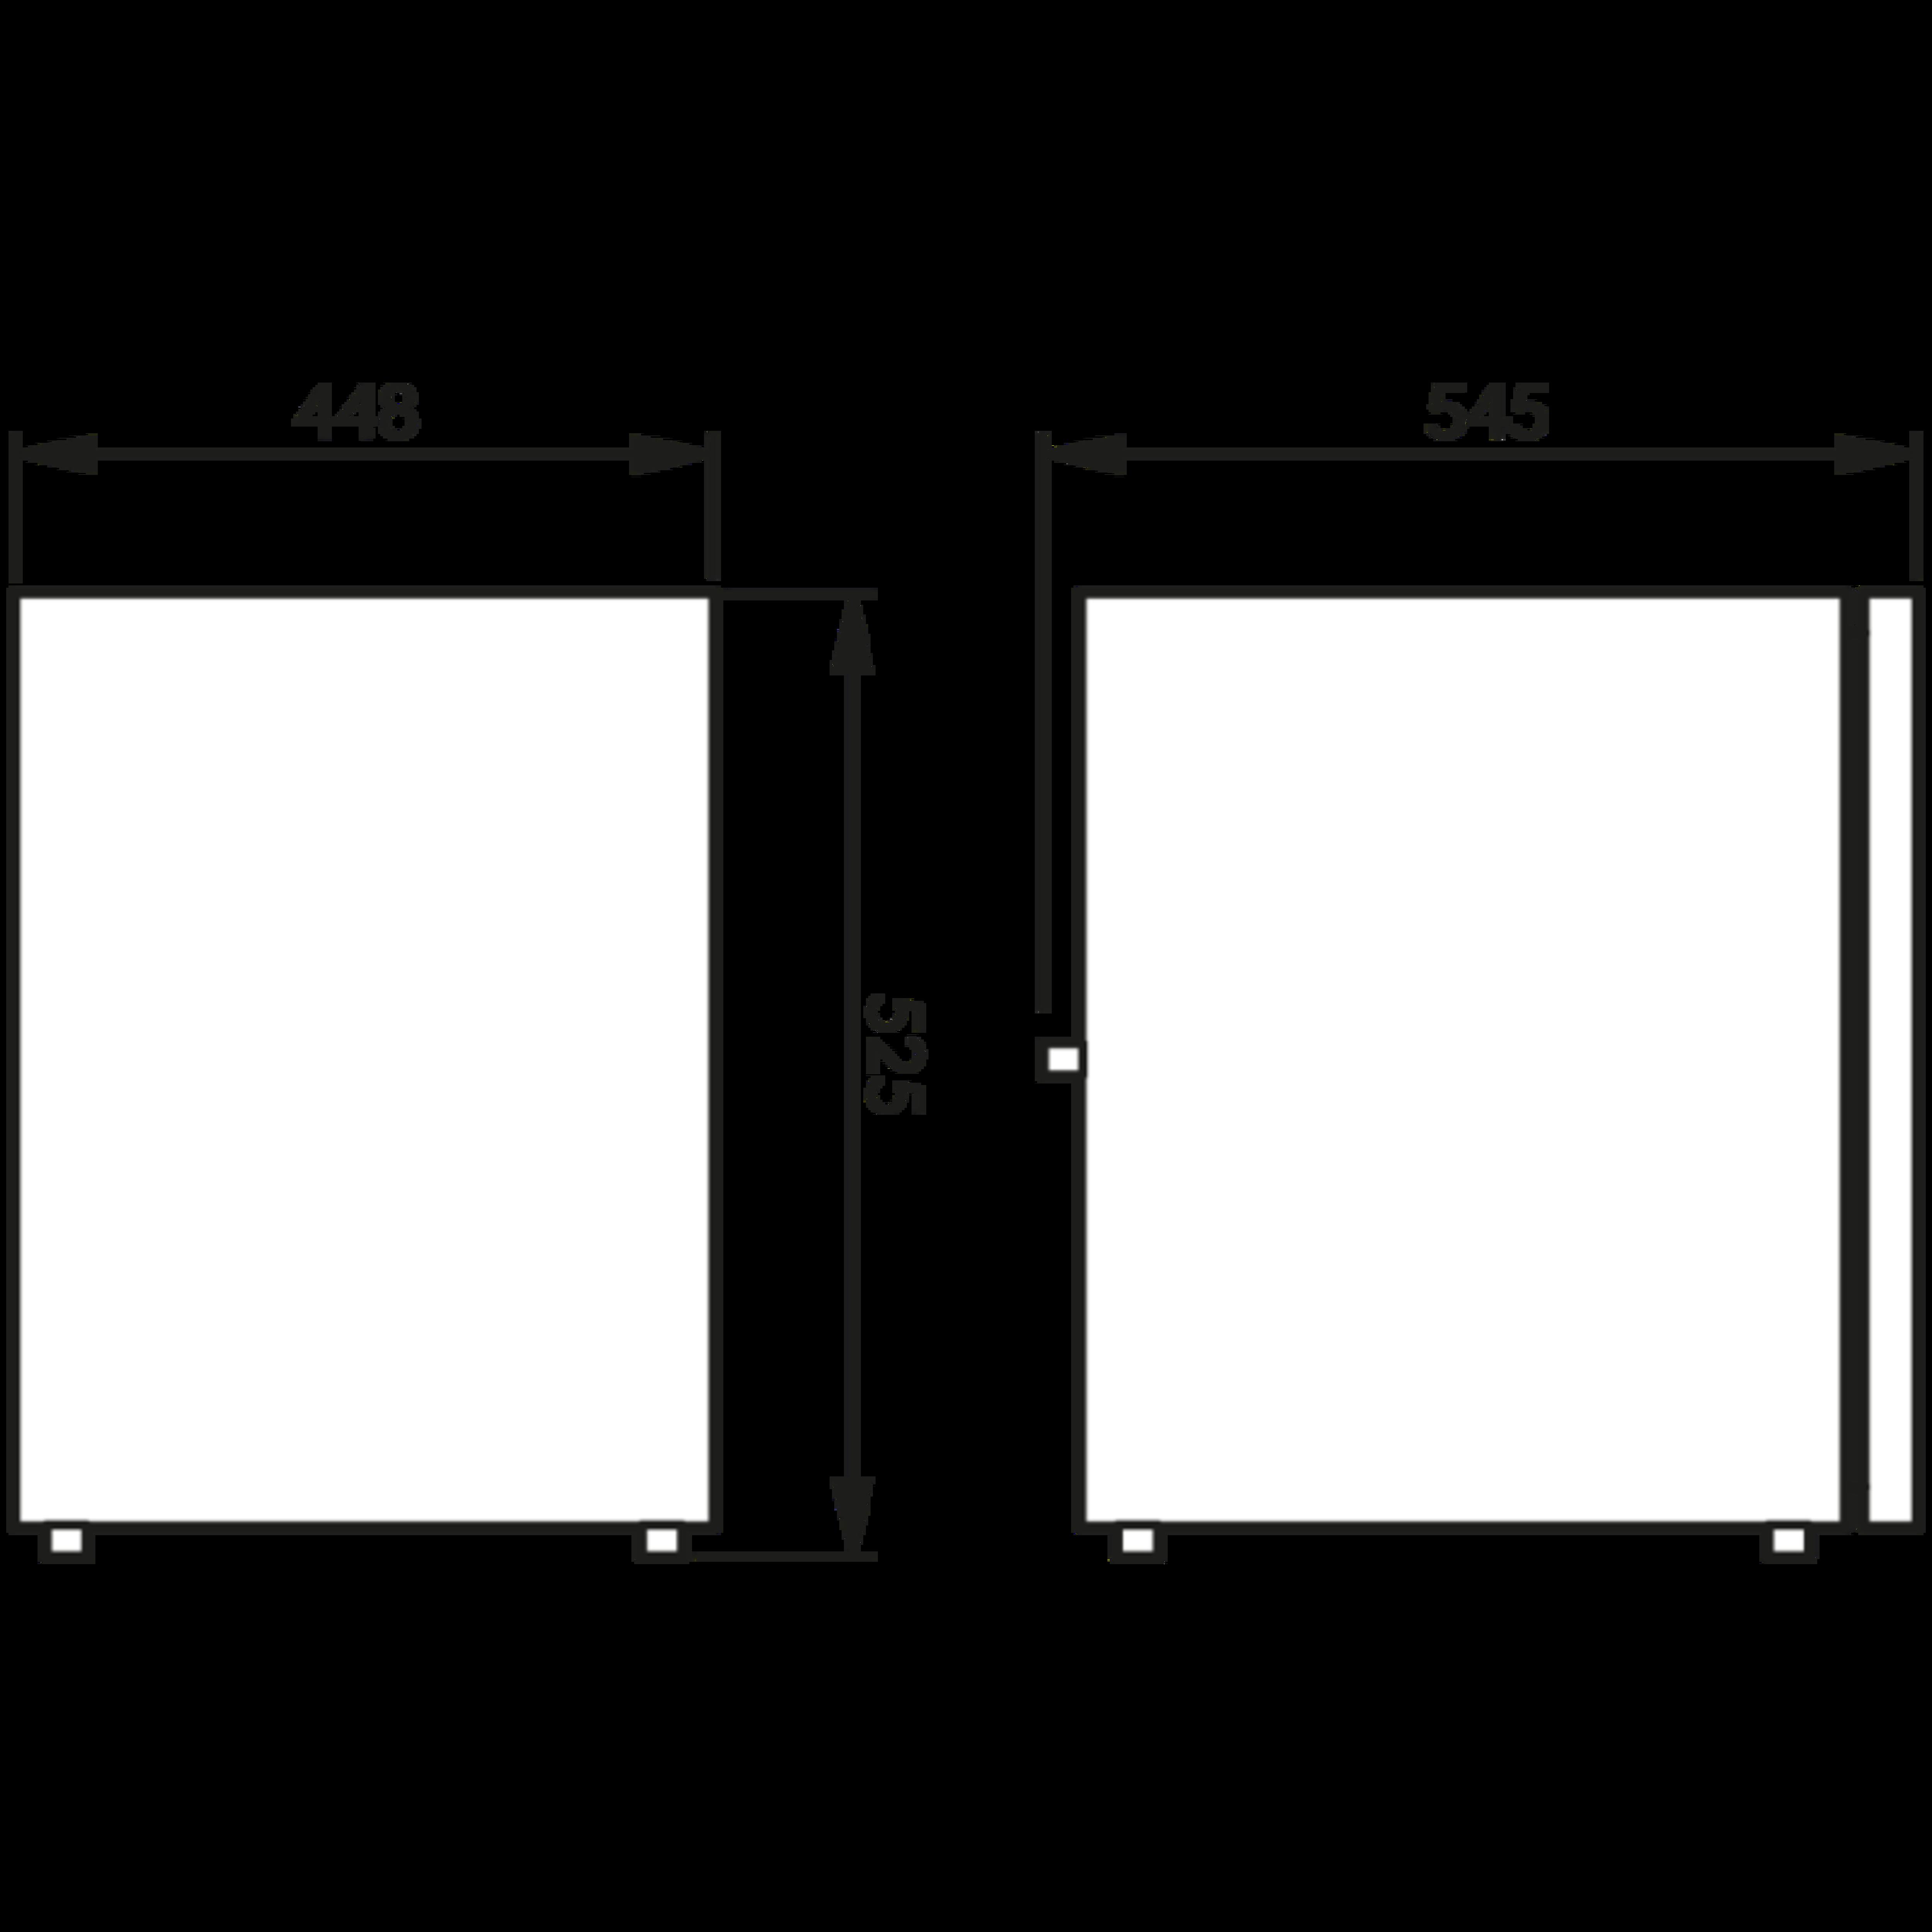 CRX65 Dimensions